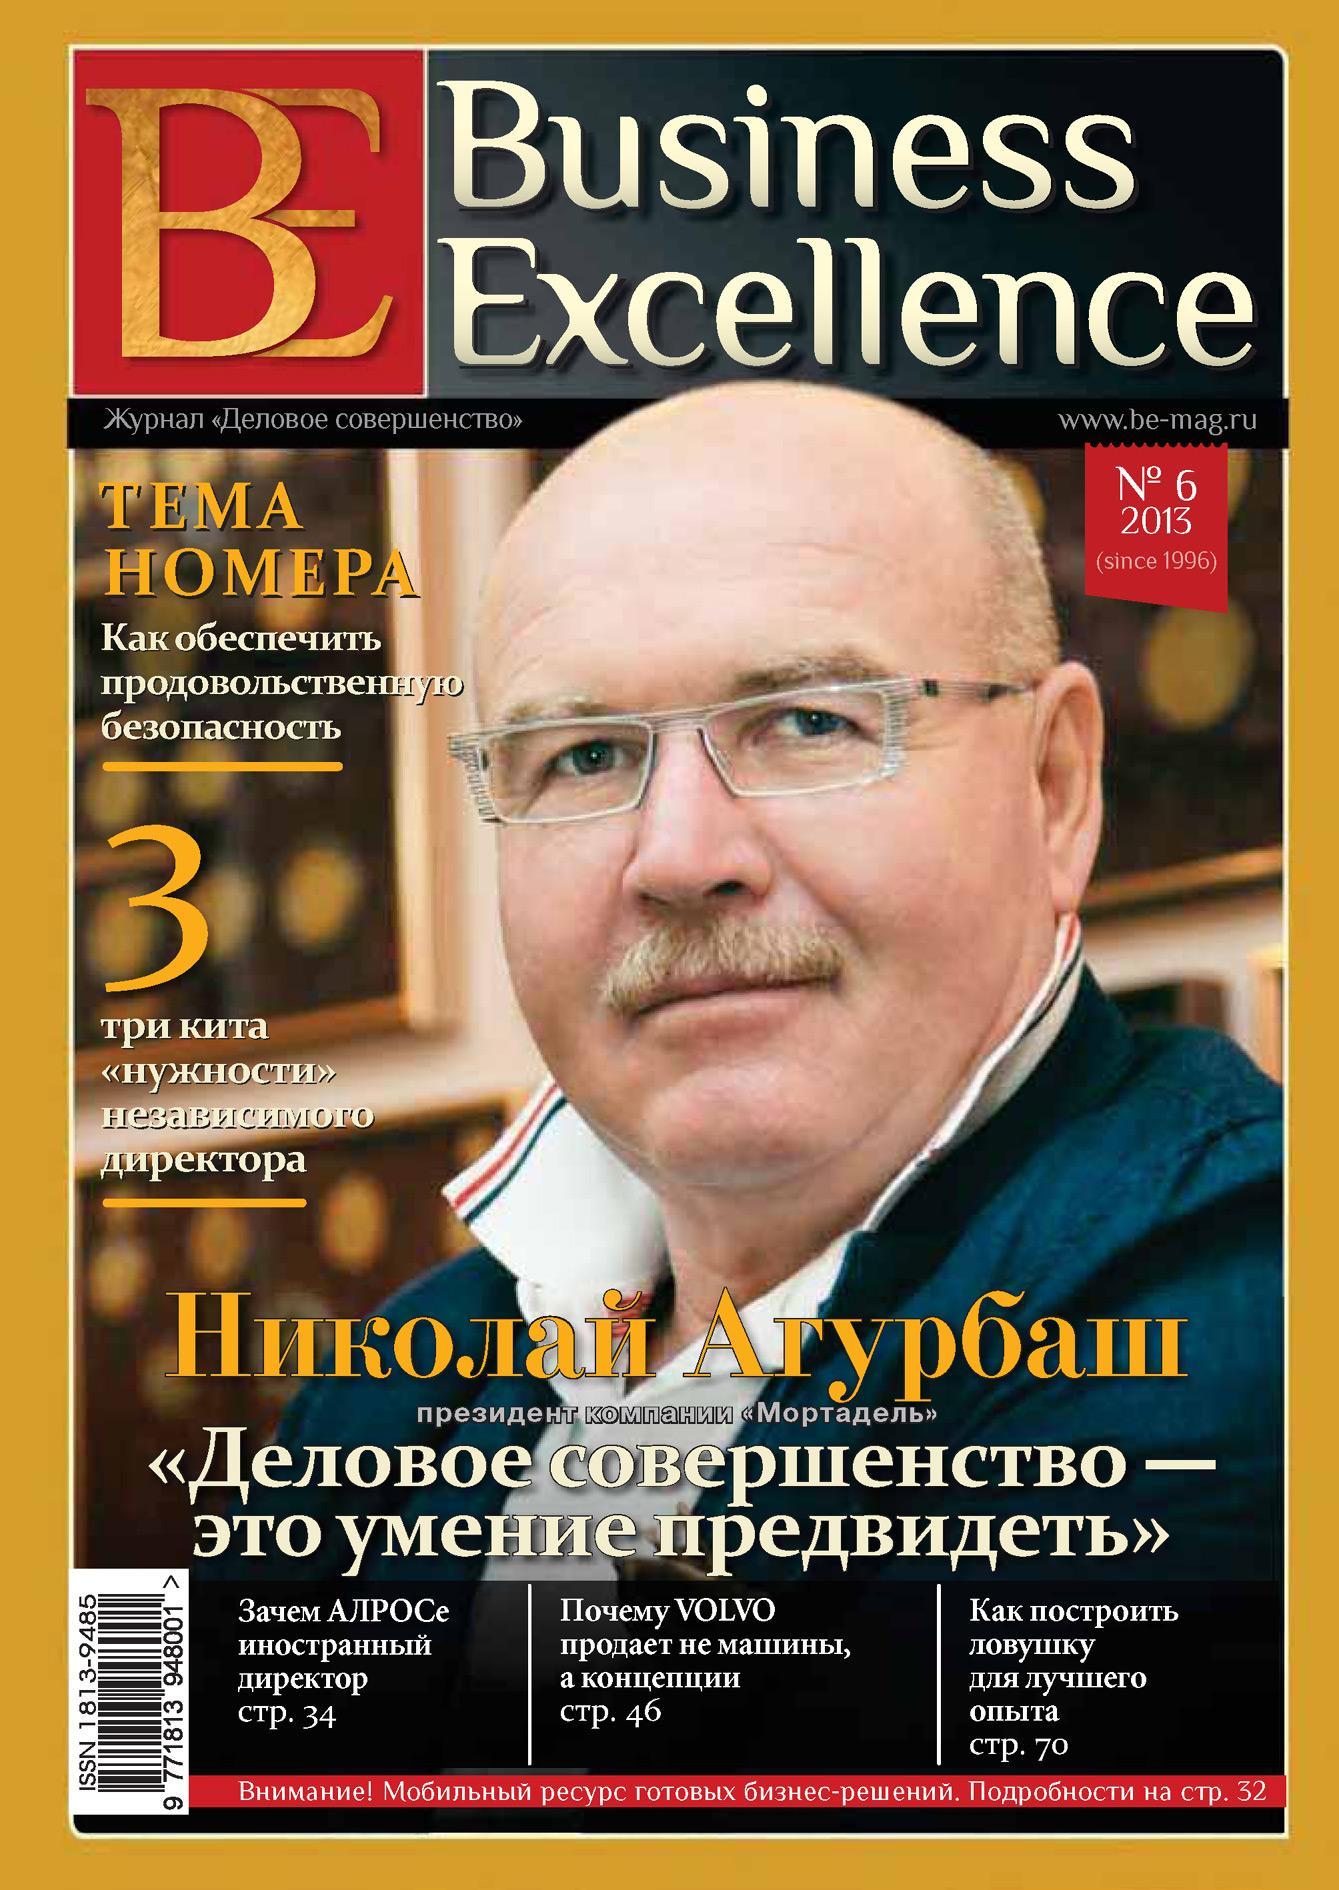 Business Excellence (Деловое совершенство) № 6 (180) 2013